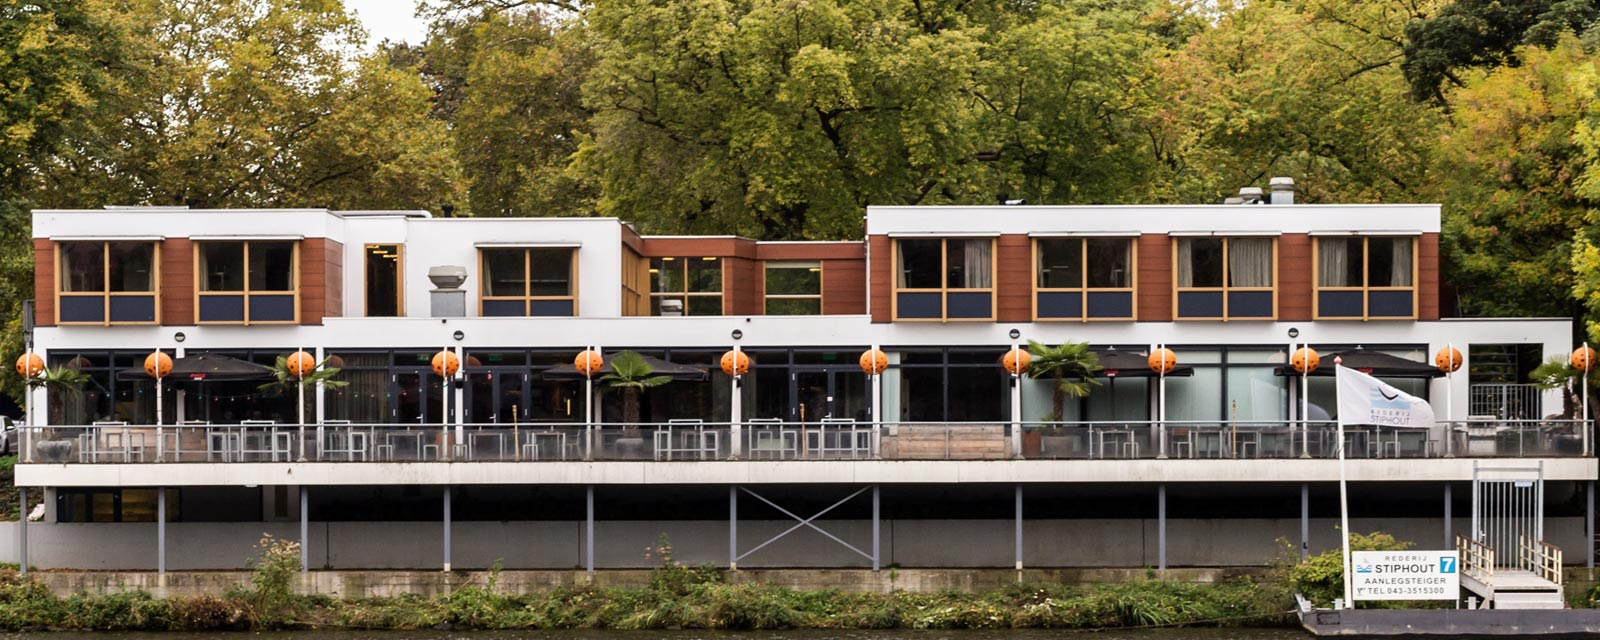 Stayokay Maastricht.jpg